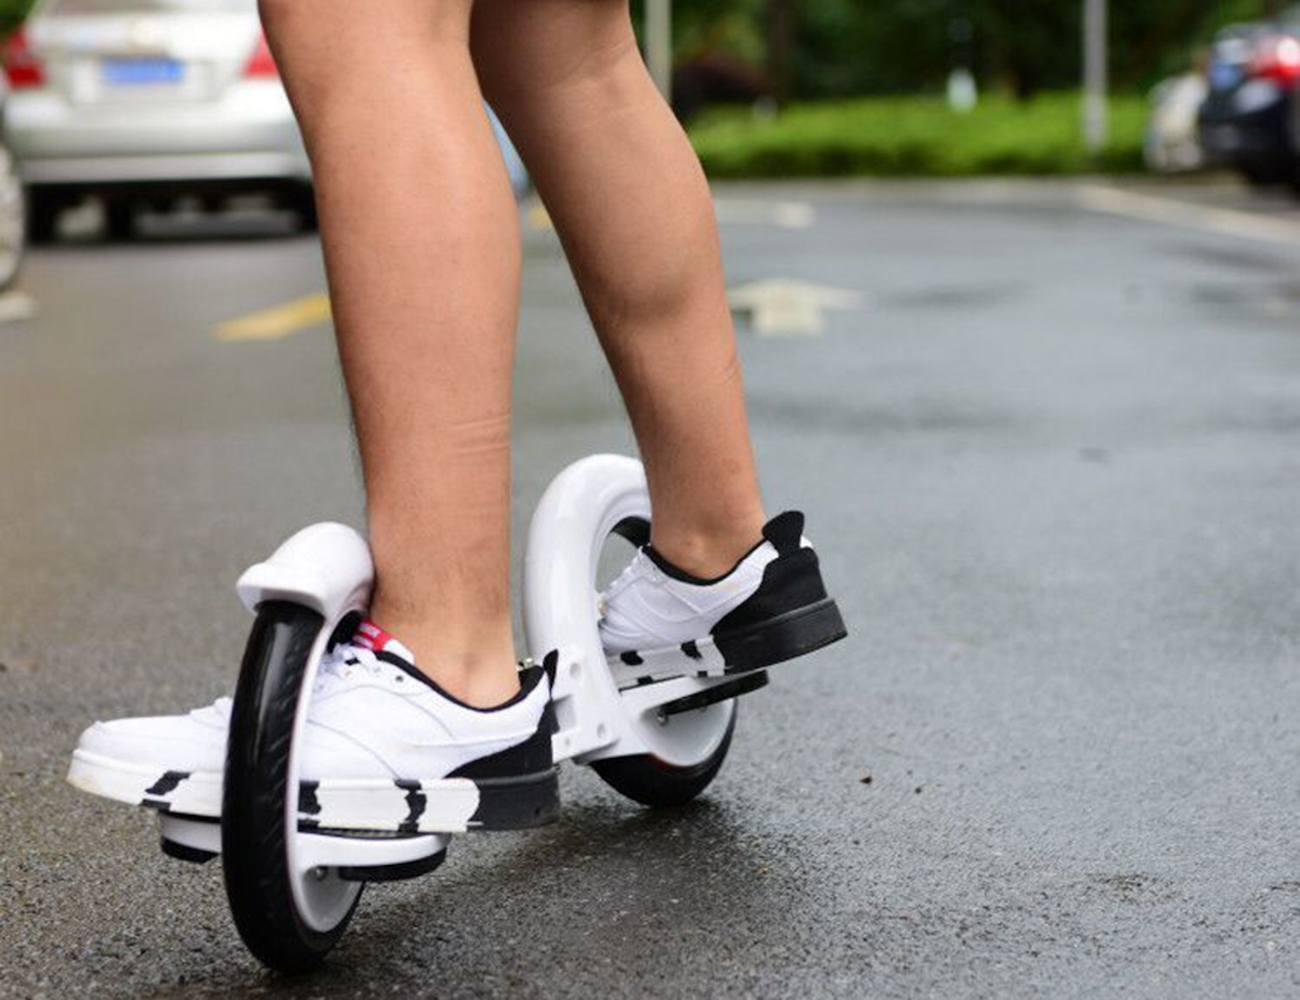 Skatecycle Hubless Skateboard